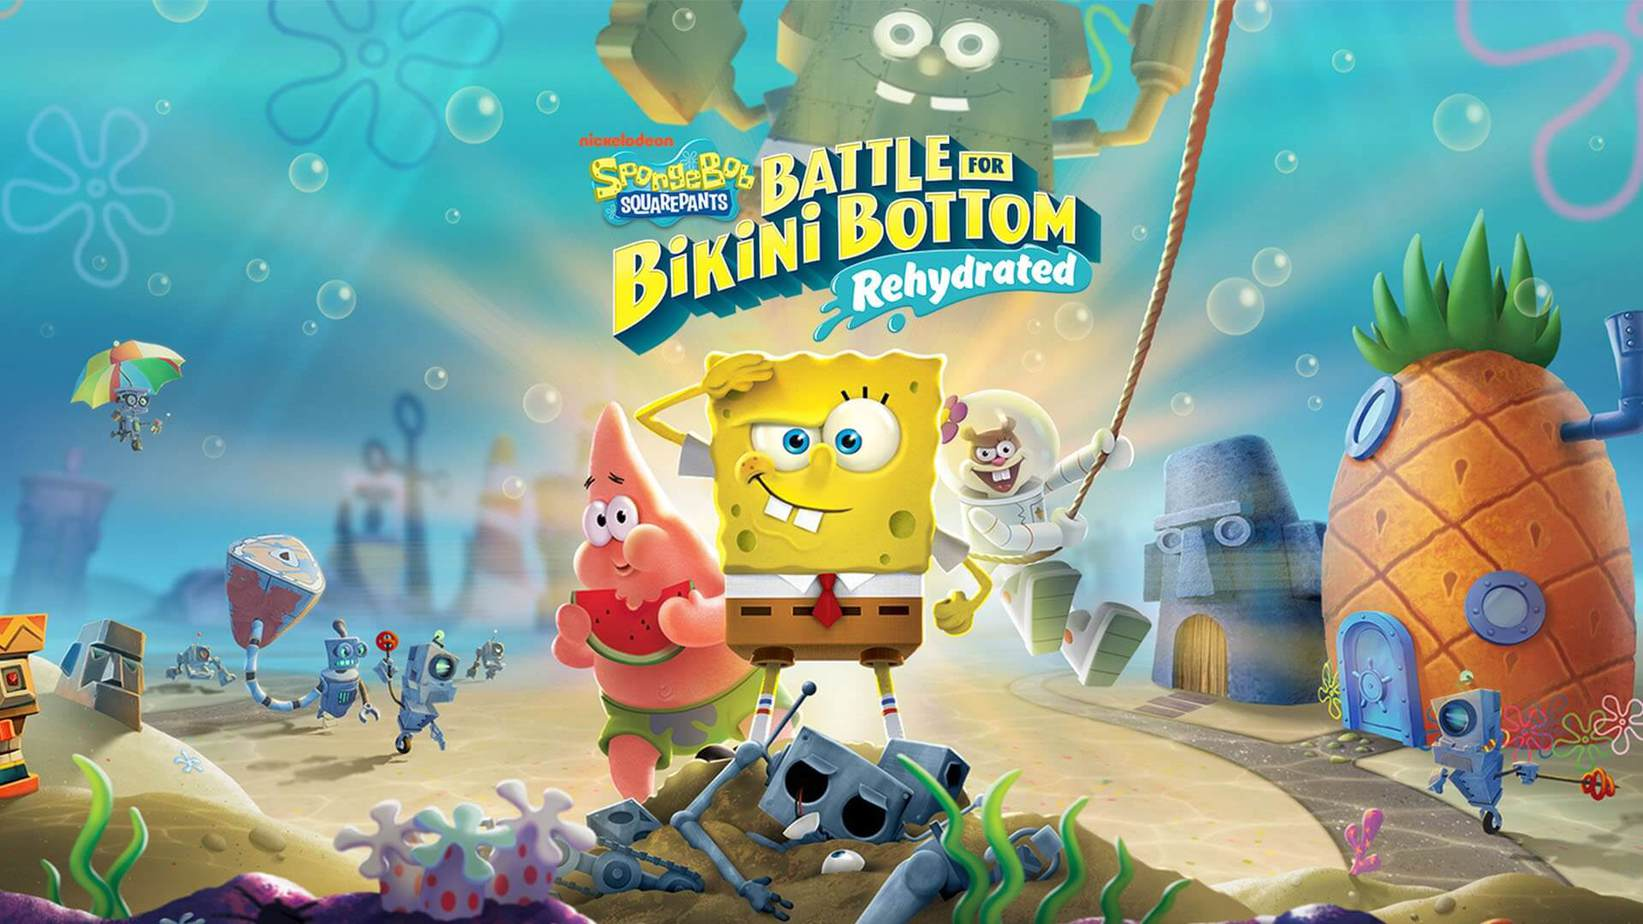 PS4 Spongebob SquarePants Battle for Bikini Bottom – Rehydrated (Spužva Bob) ok